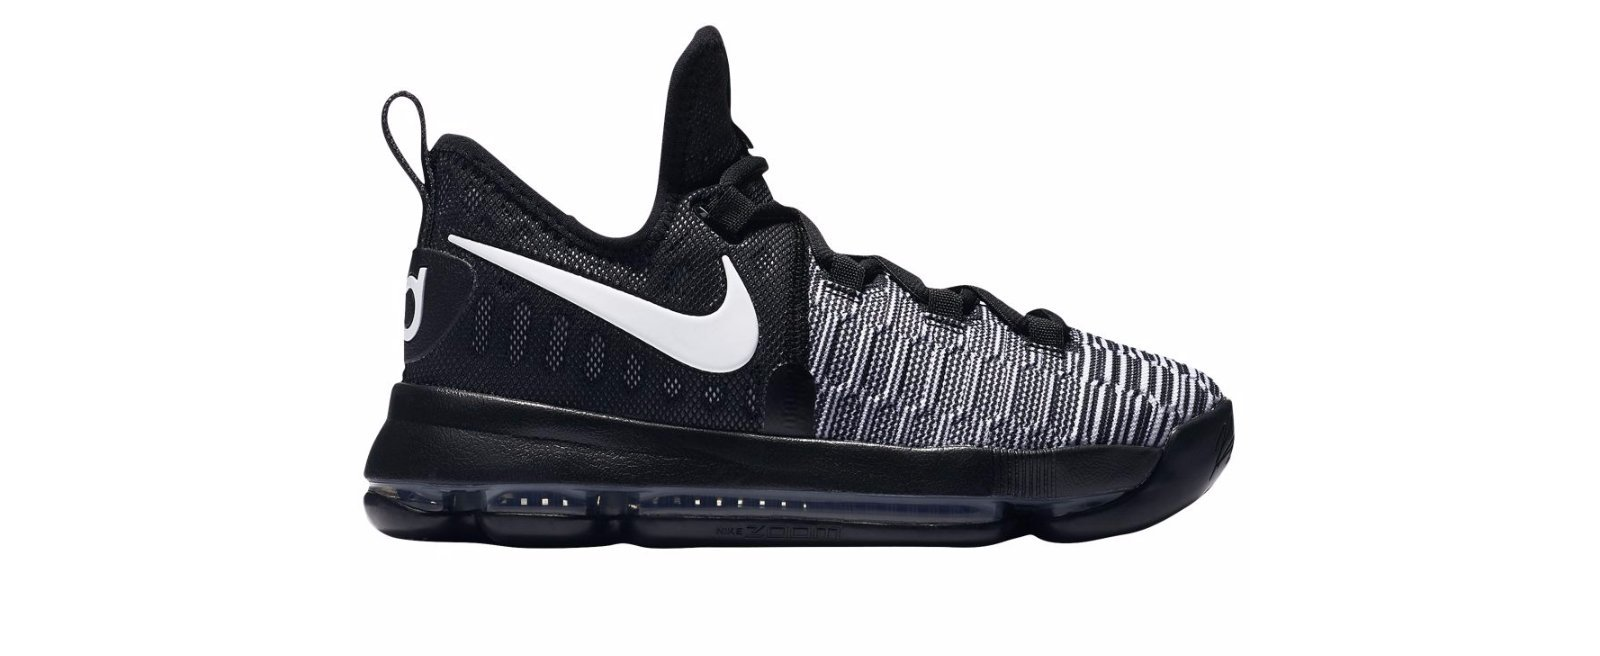 Nike Zoom KD9(GS) Big Kids Basketball Shoes Black/White 855908-010 (5.5 M US)